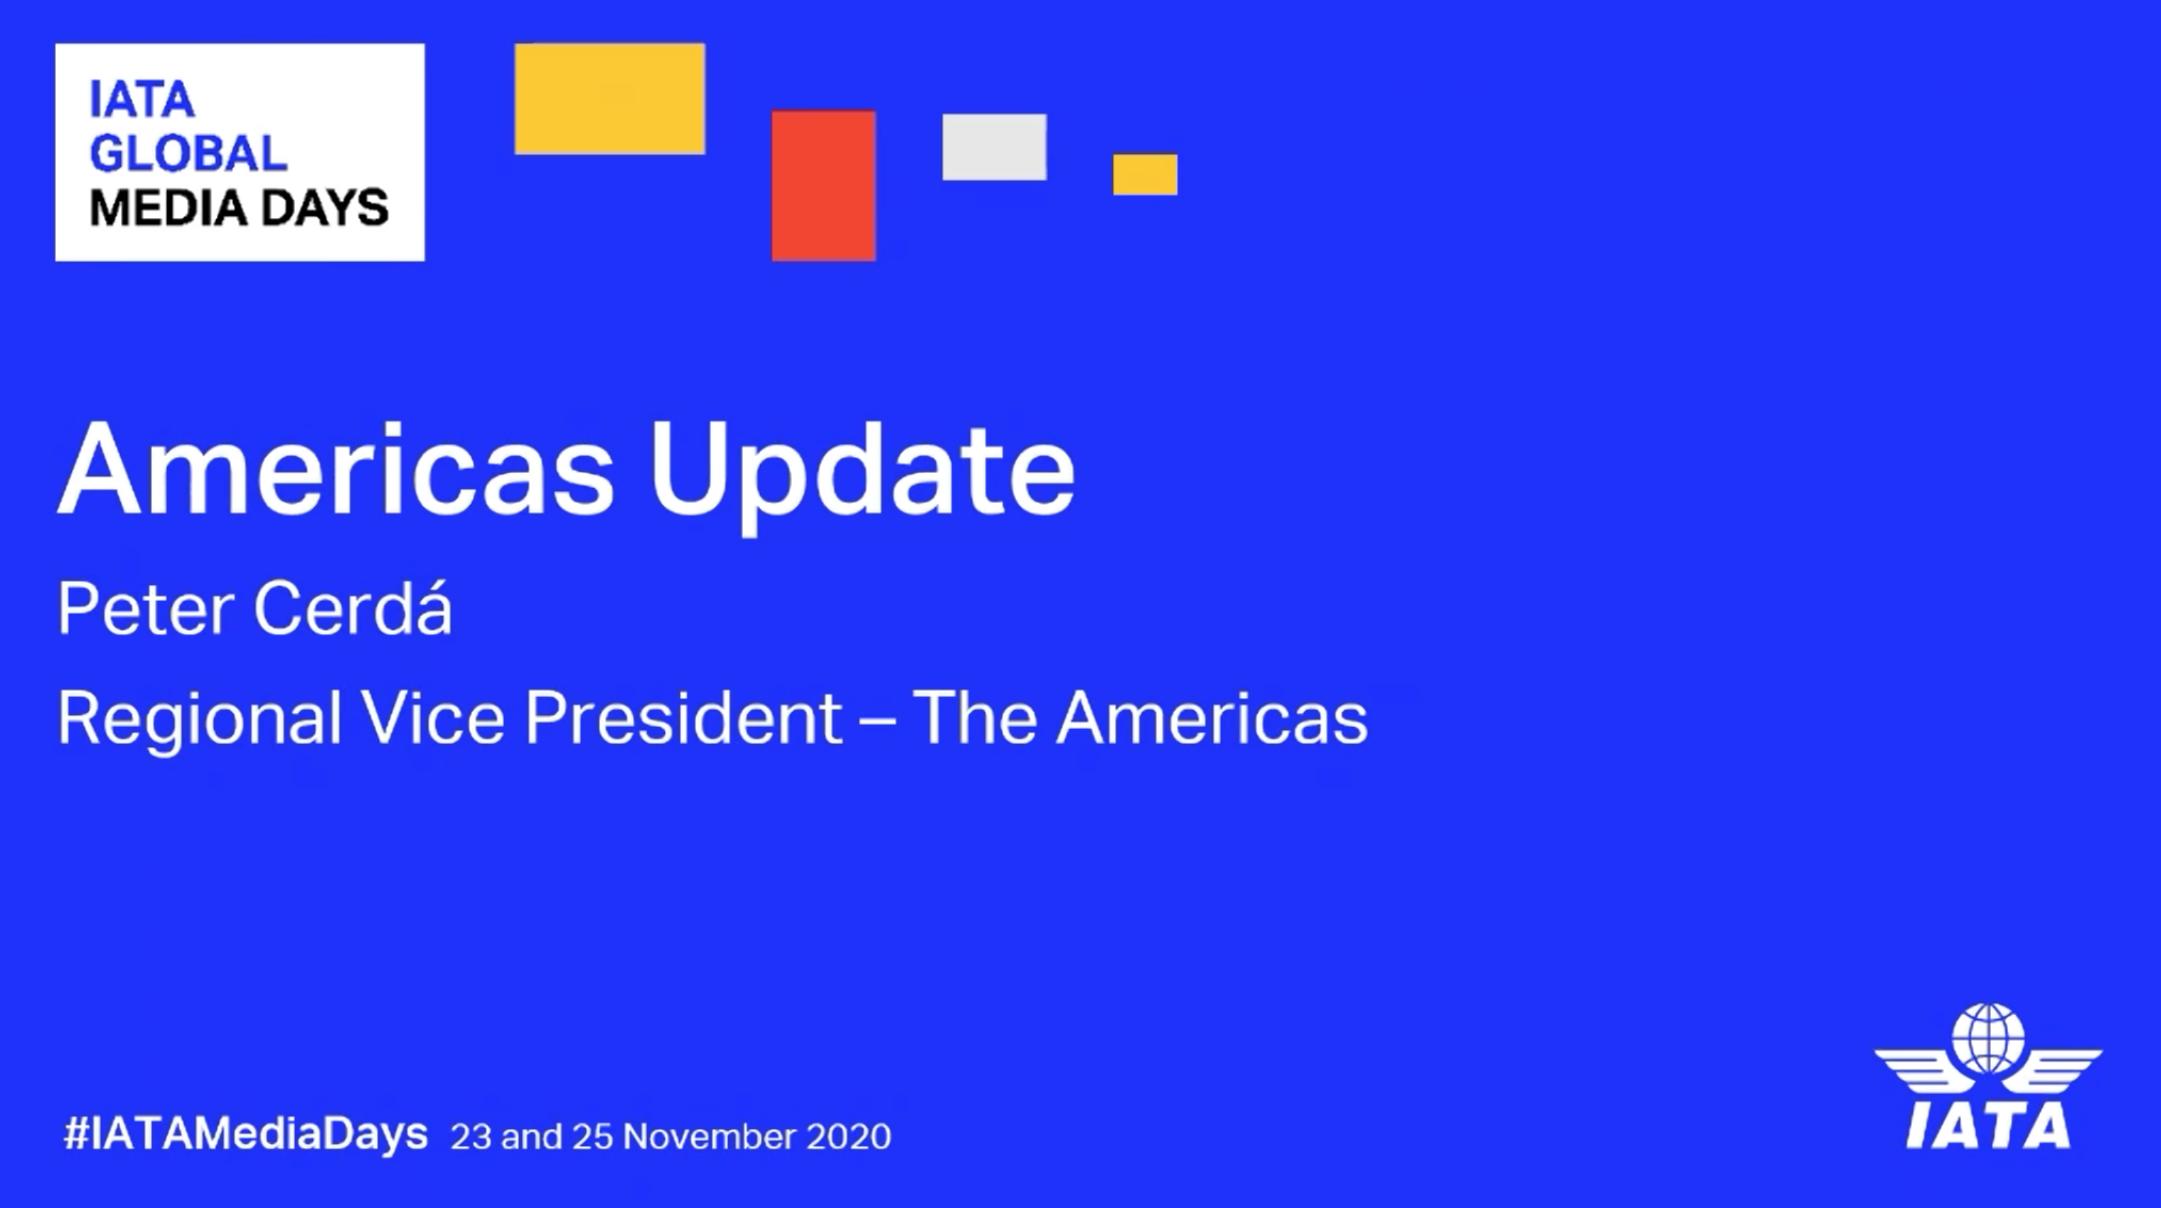 IATA Global Media Days – The Americas Briefing, 25 November 2020